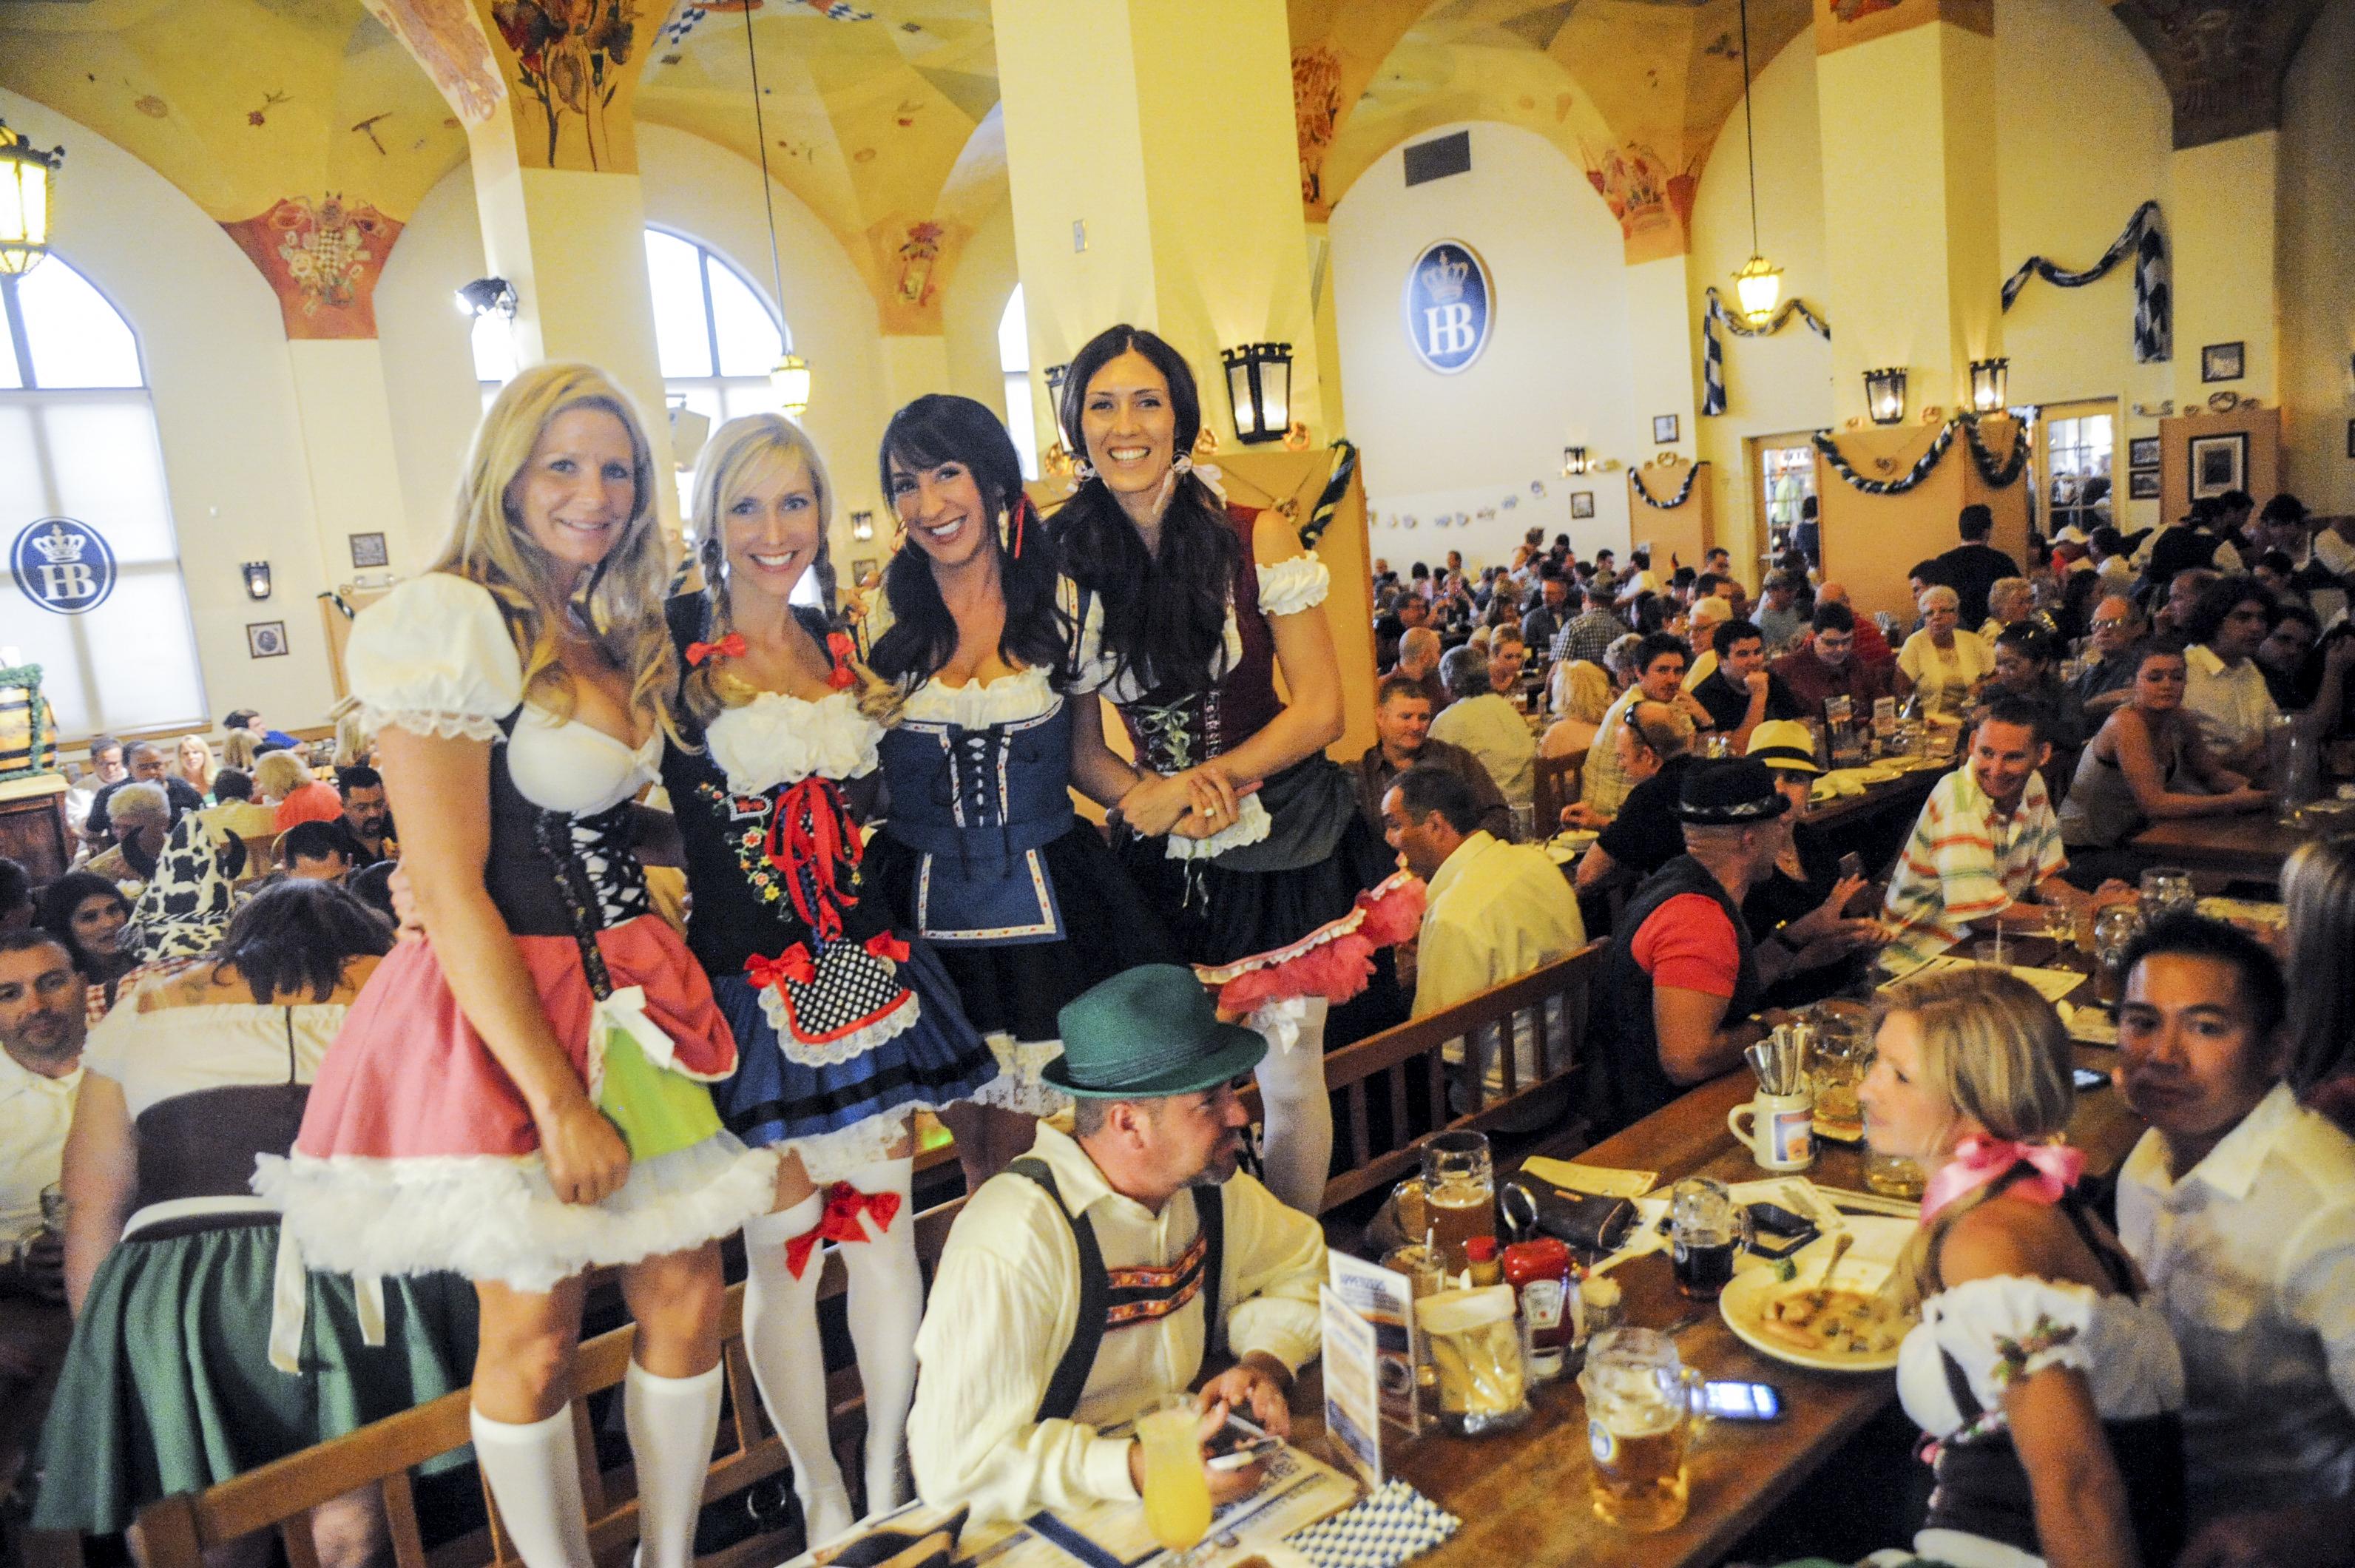 Hofbräuhaus restaurant and beer hall Las Vegas